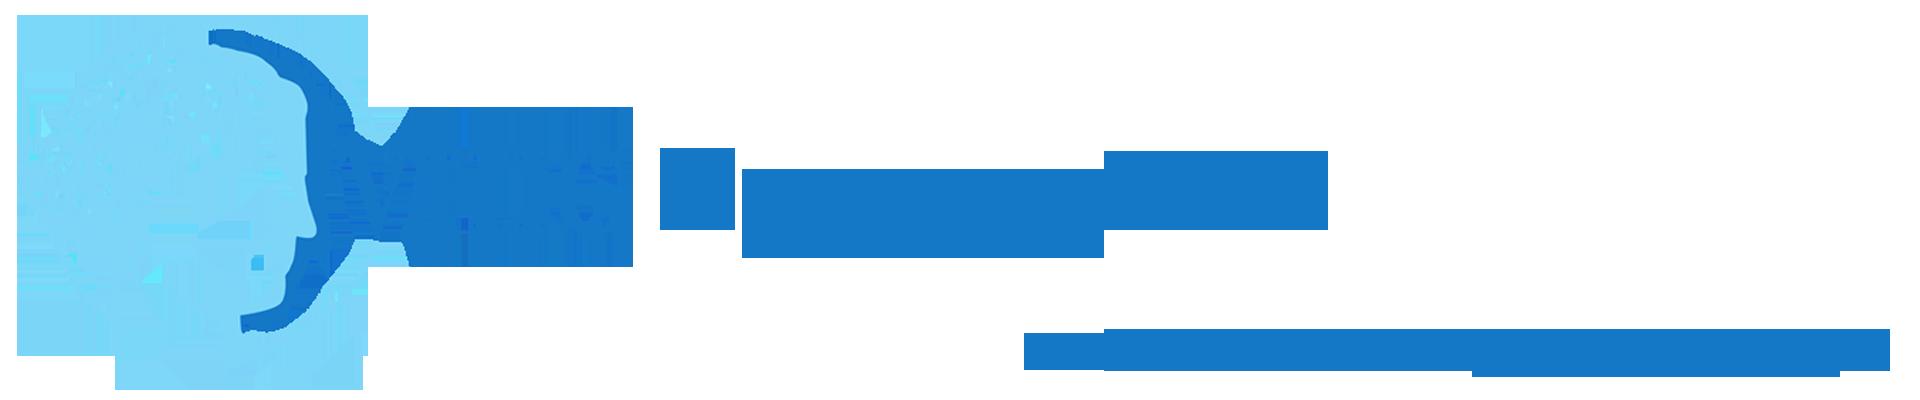 VHIG Beurs 2020